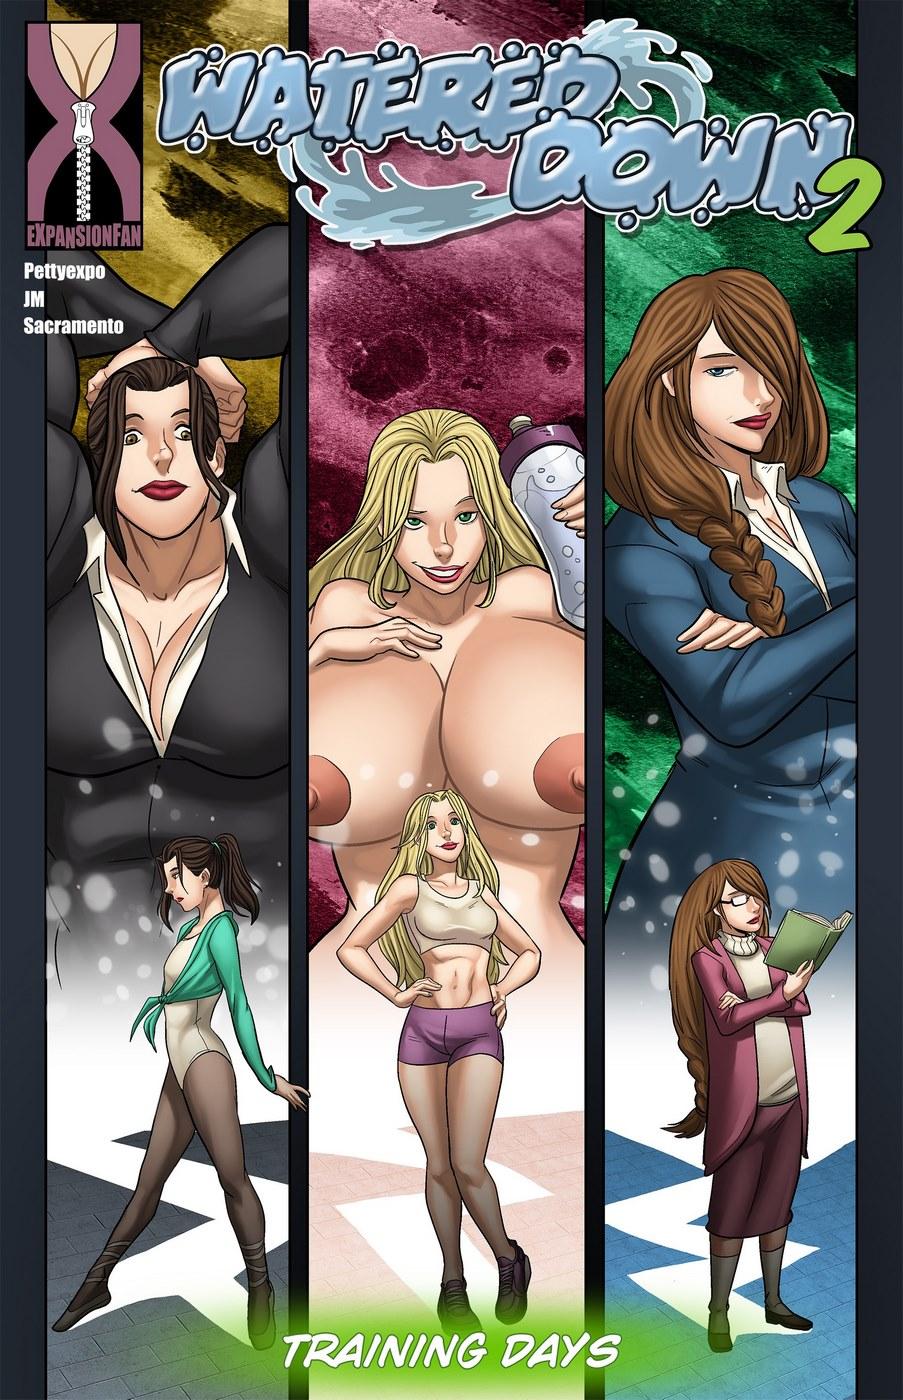 Milftoon comics 8 muses